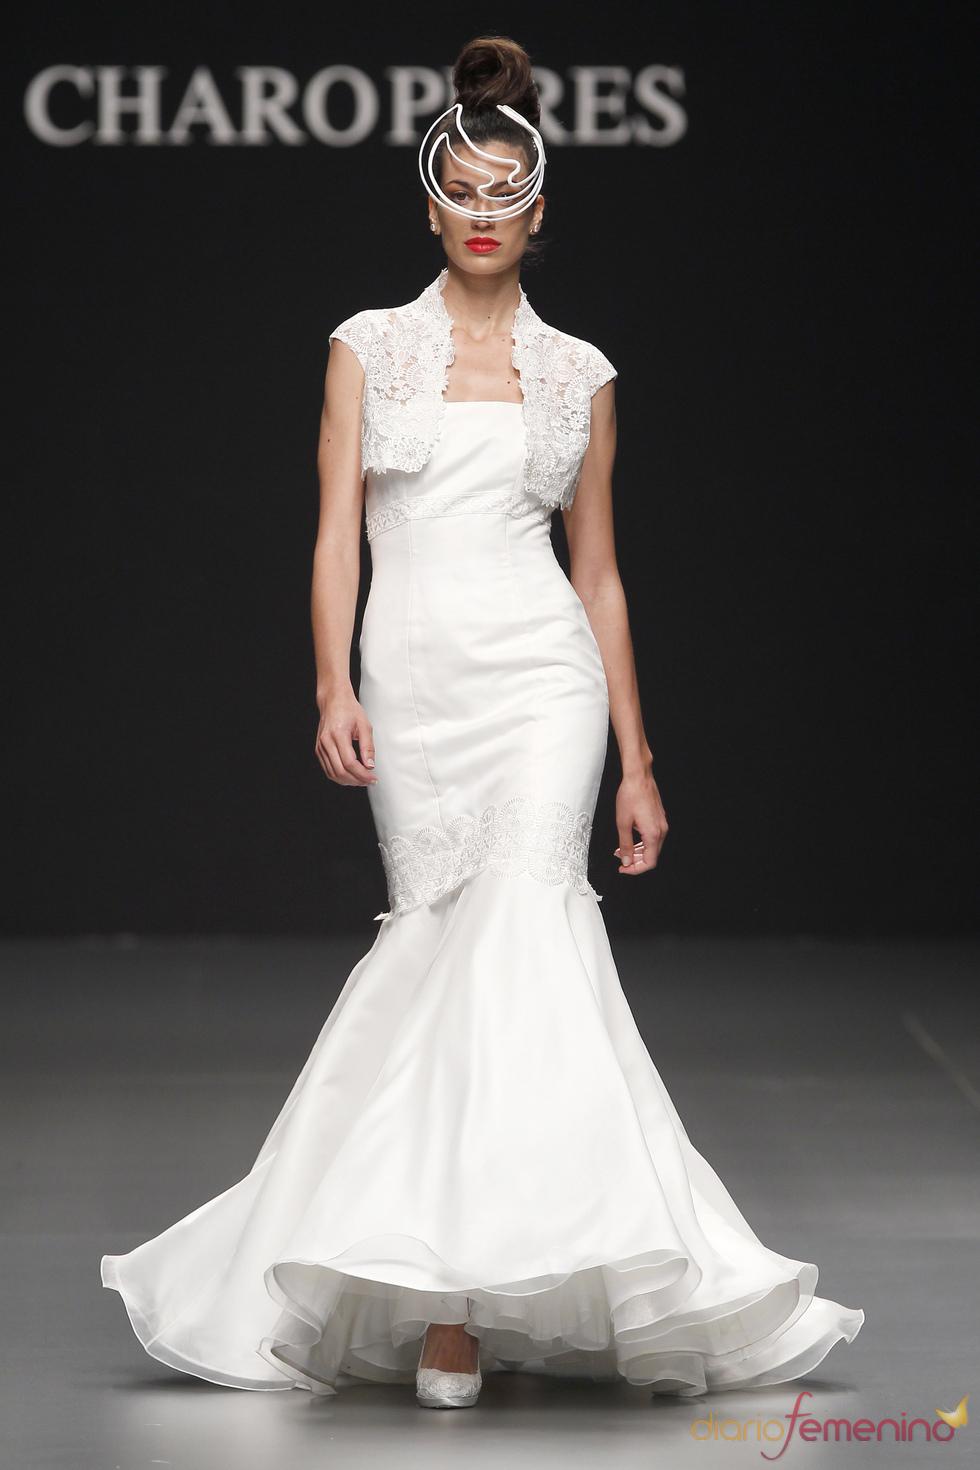 Vestido de novia de Charo Peres